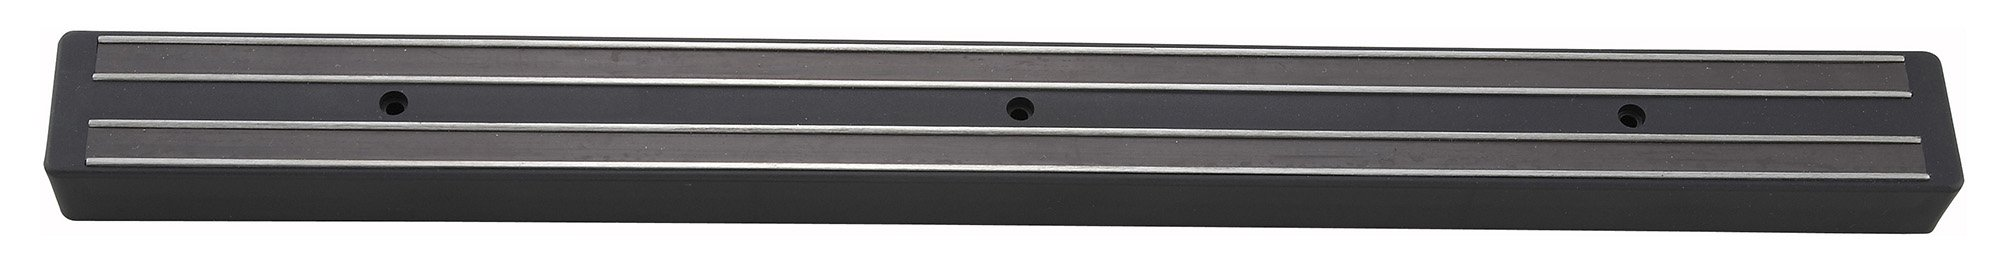 13 Magnetic Knife Holder, Plastic Base